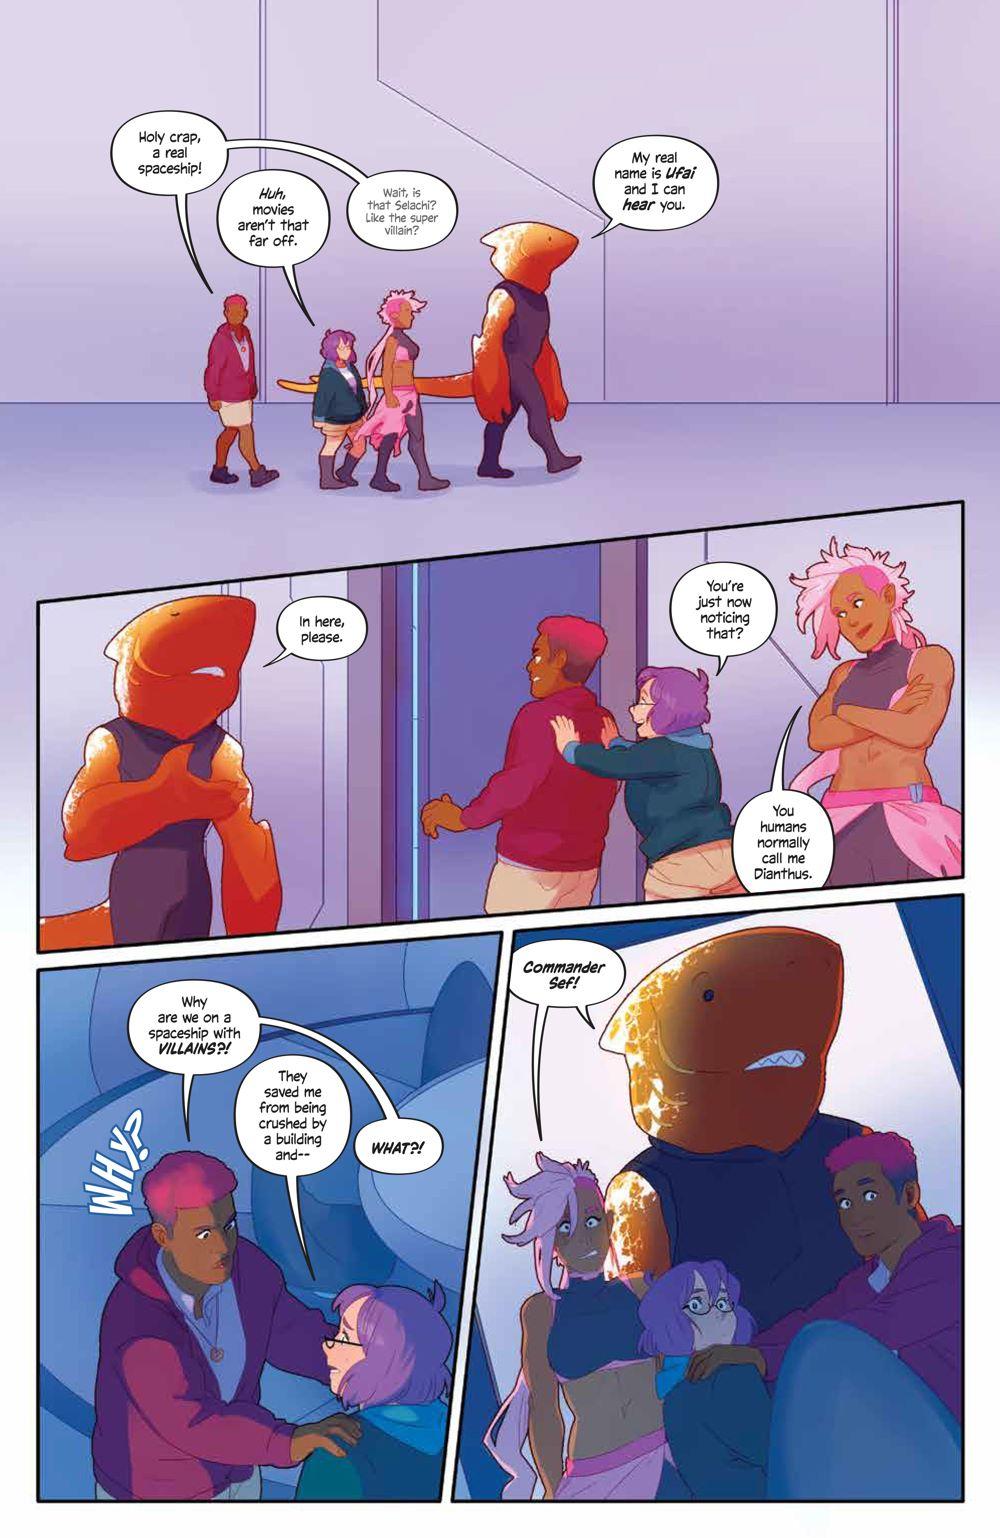 SaveYourself_002_PRESS_6 ComicList Previews: SAVE YOURSELF #2 (OF 4)